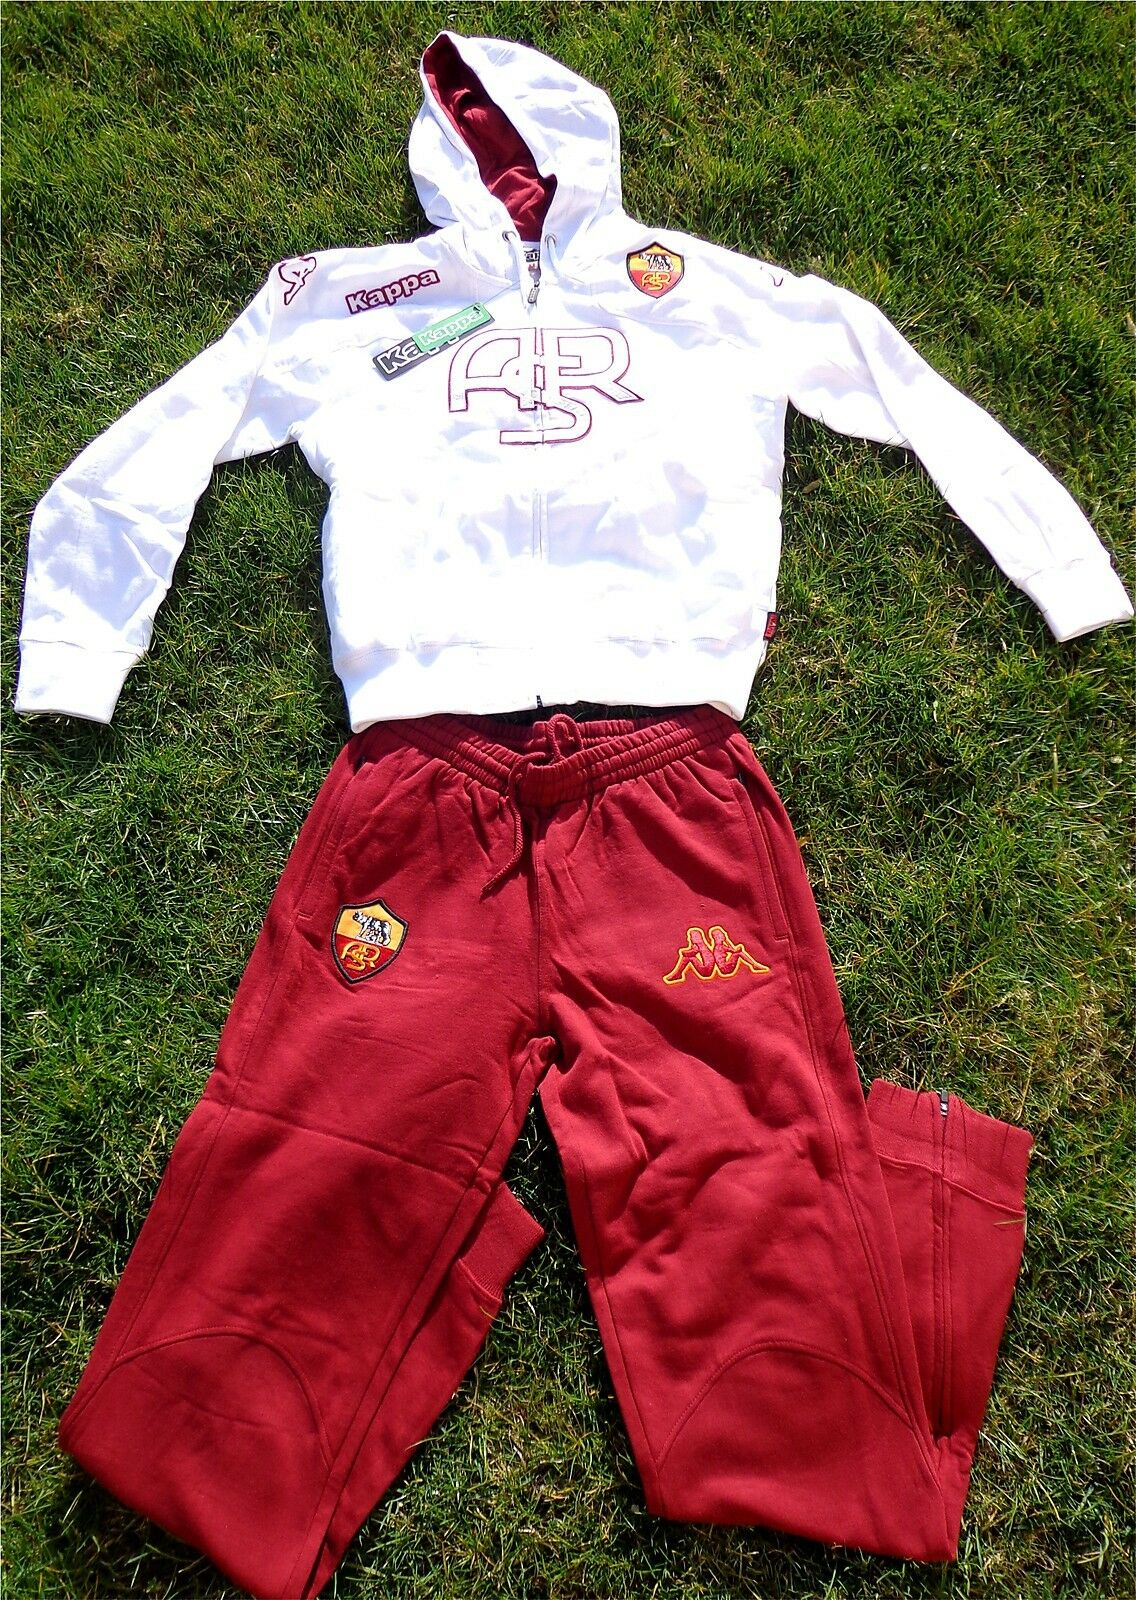 AS ROM Trainingsanzug Trainingsanzug Trainingsanzug Hoodie KAPPA Herren NEU Fan + Roma Totti  Italia a16657